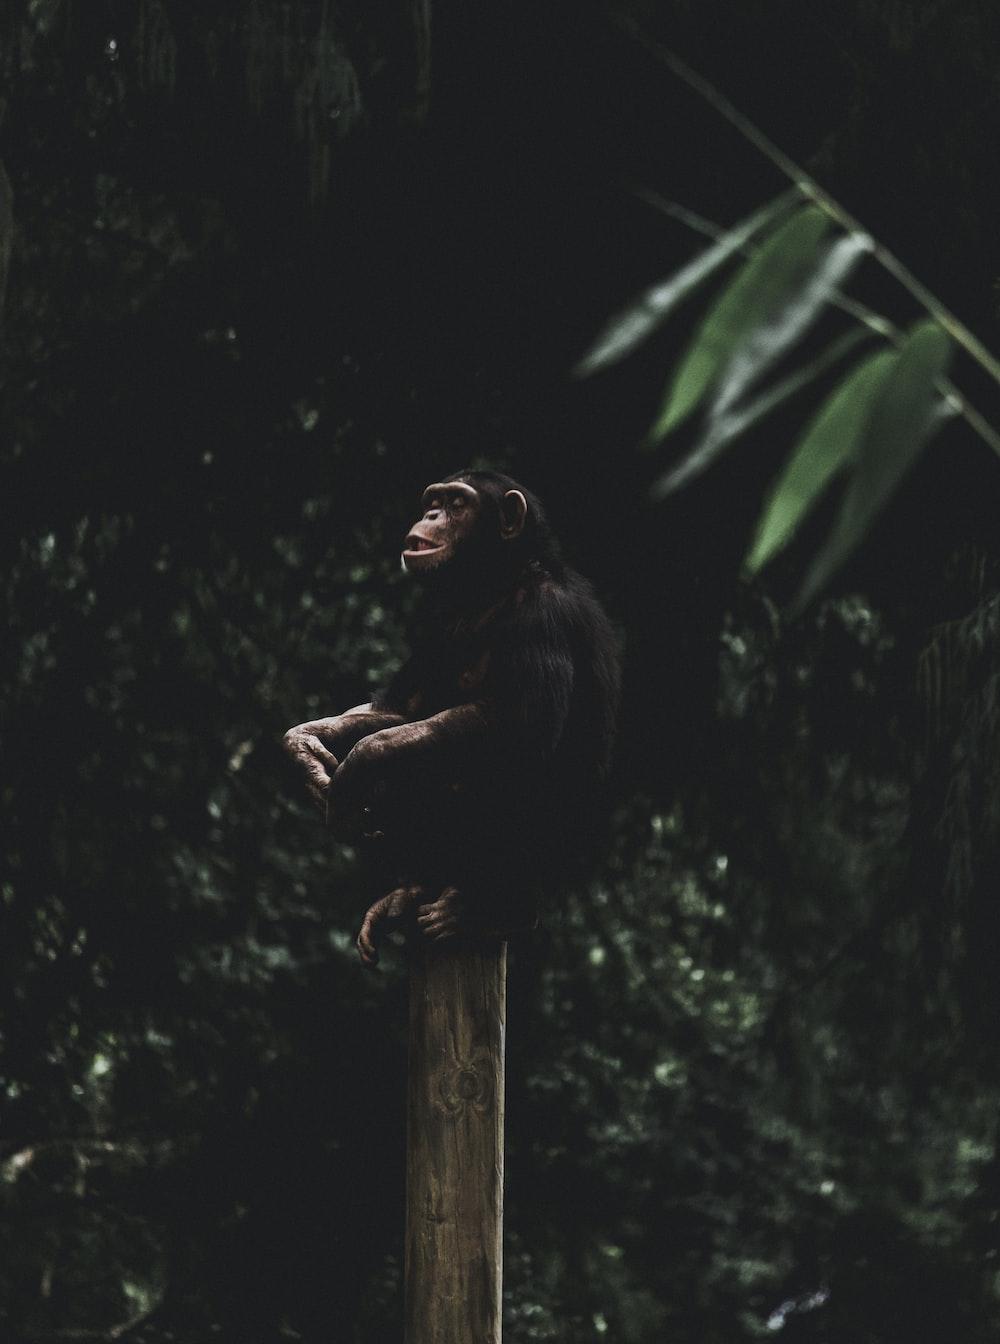 black chimpanzee on wooden post